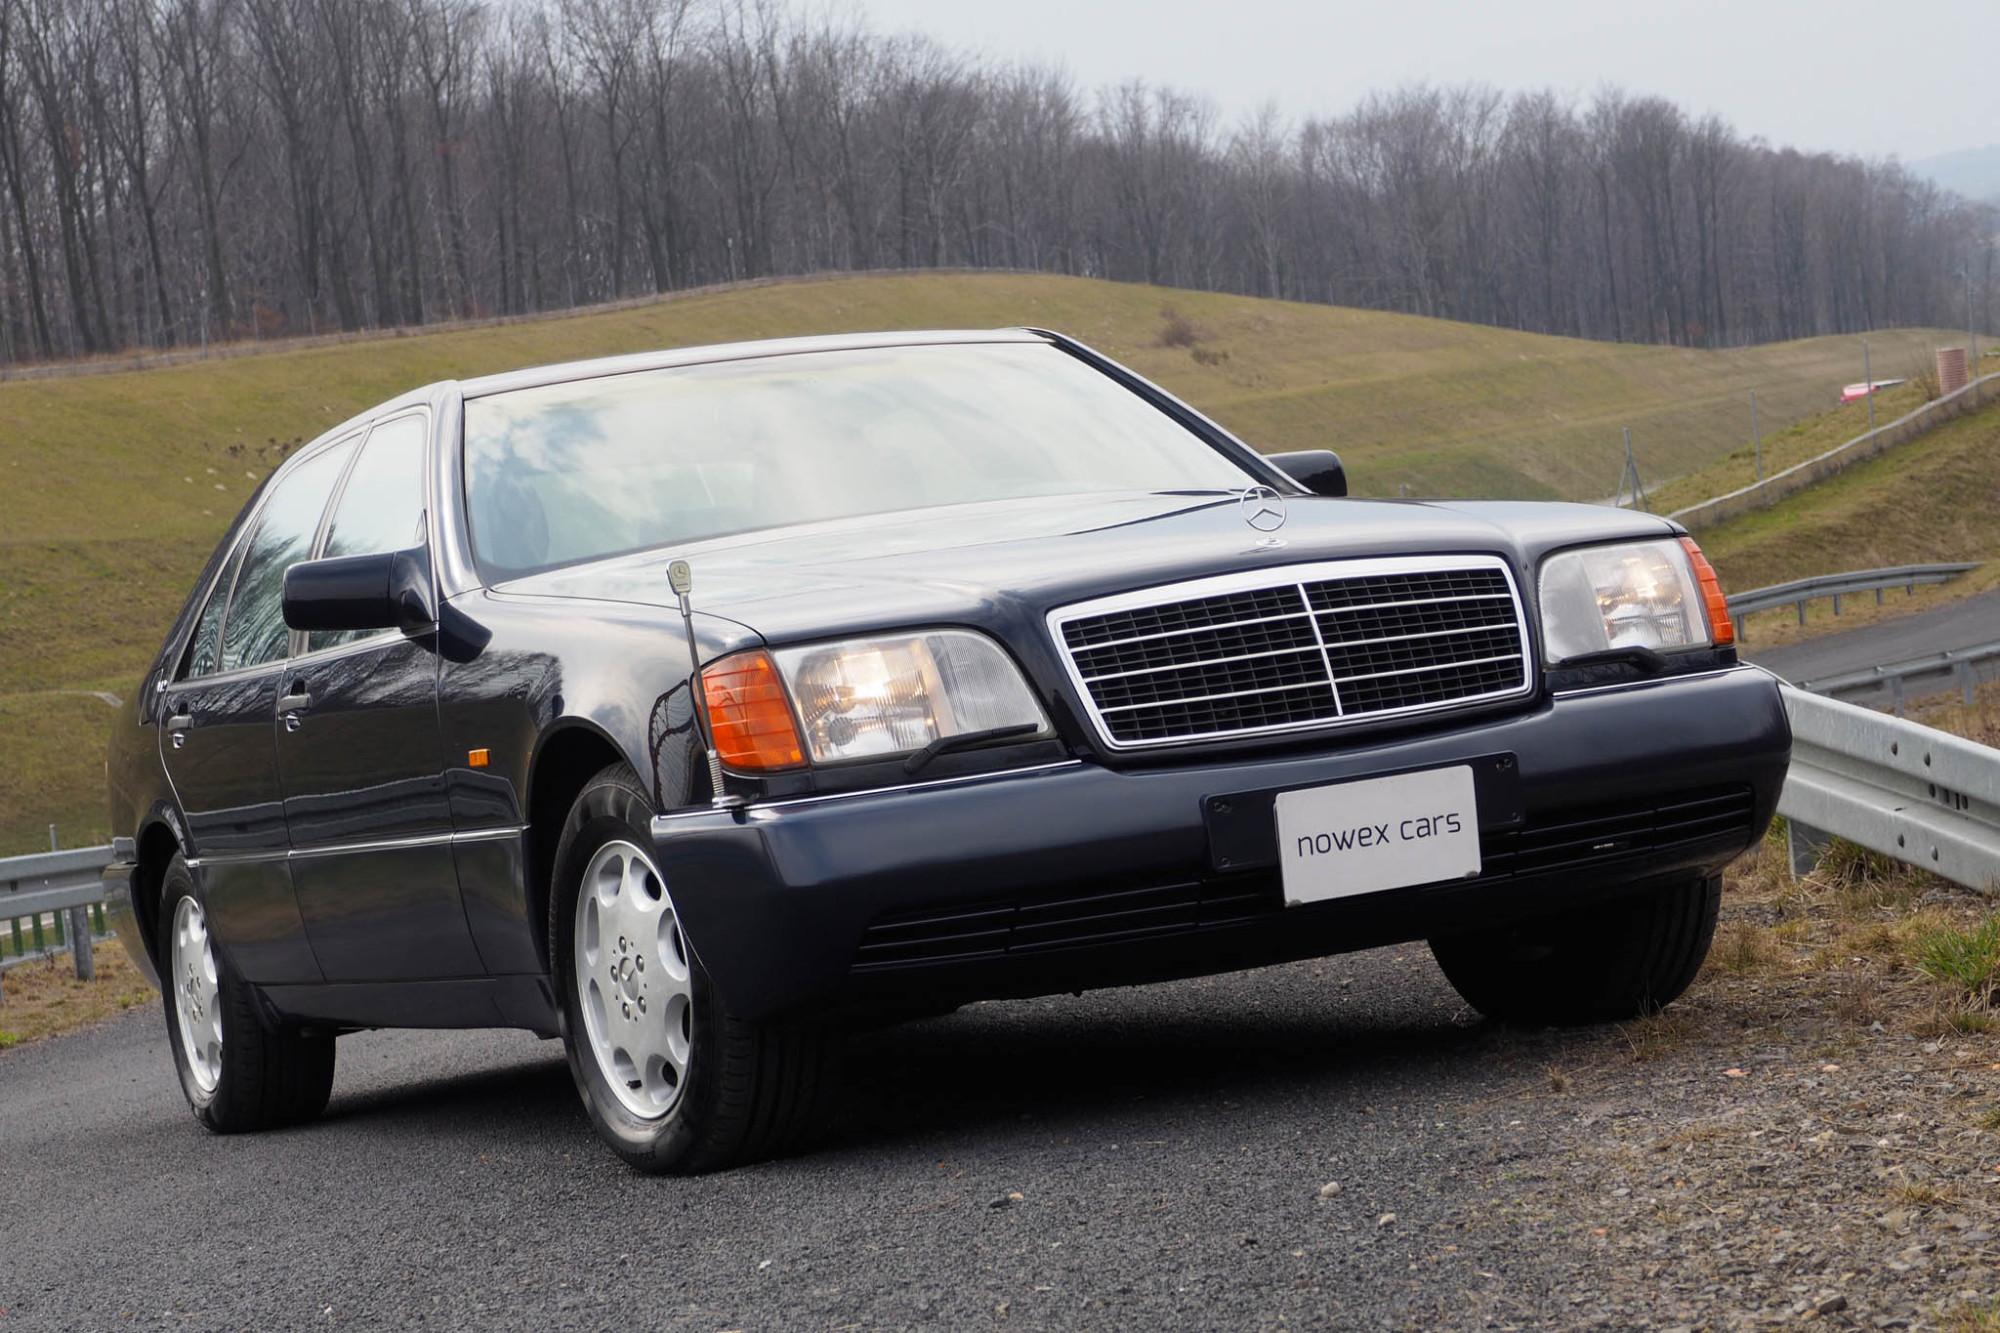 92 Mercedes Benz 600 Sel Nowex Cars